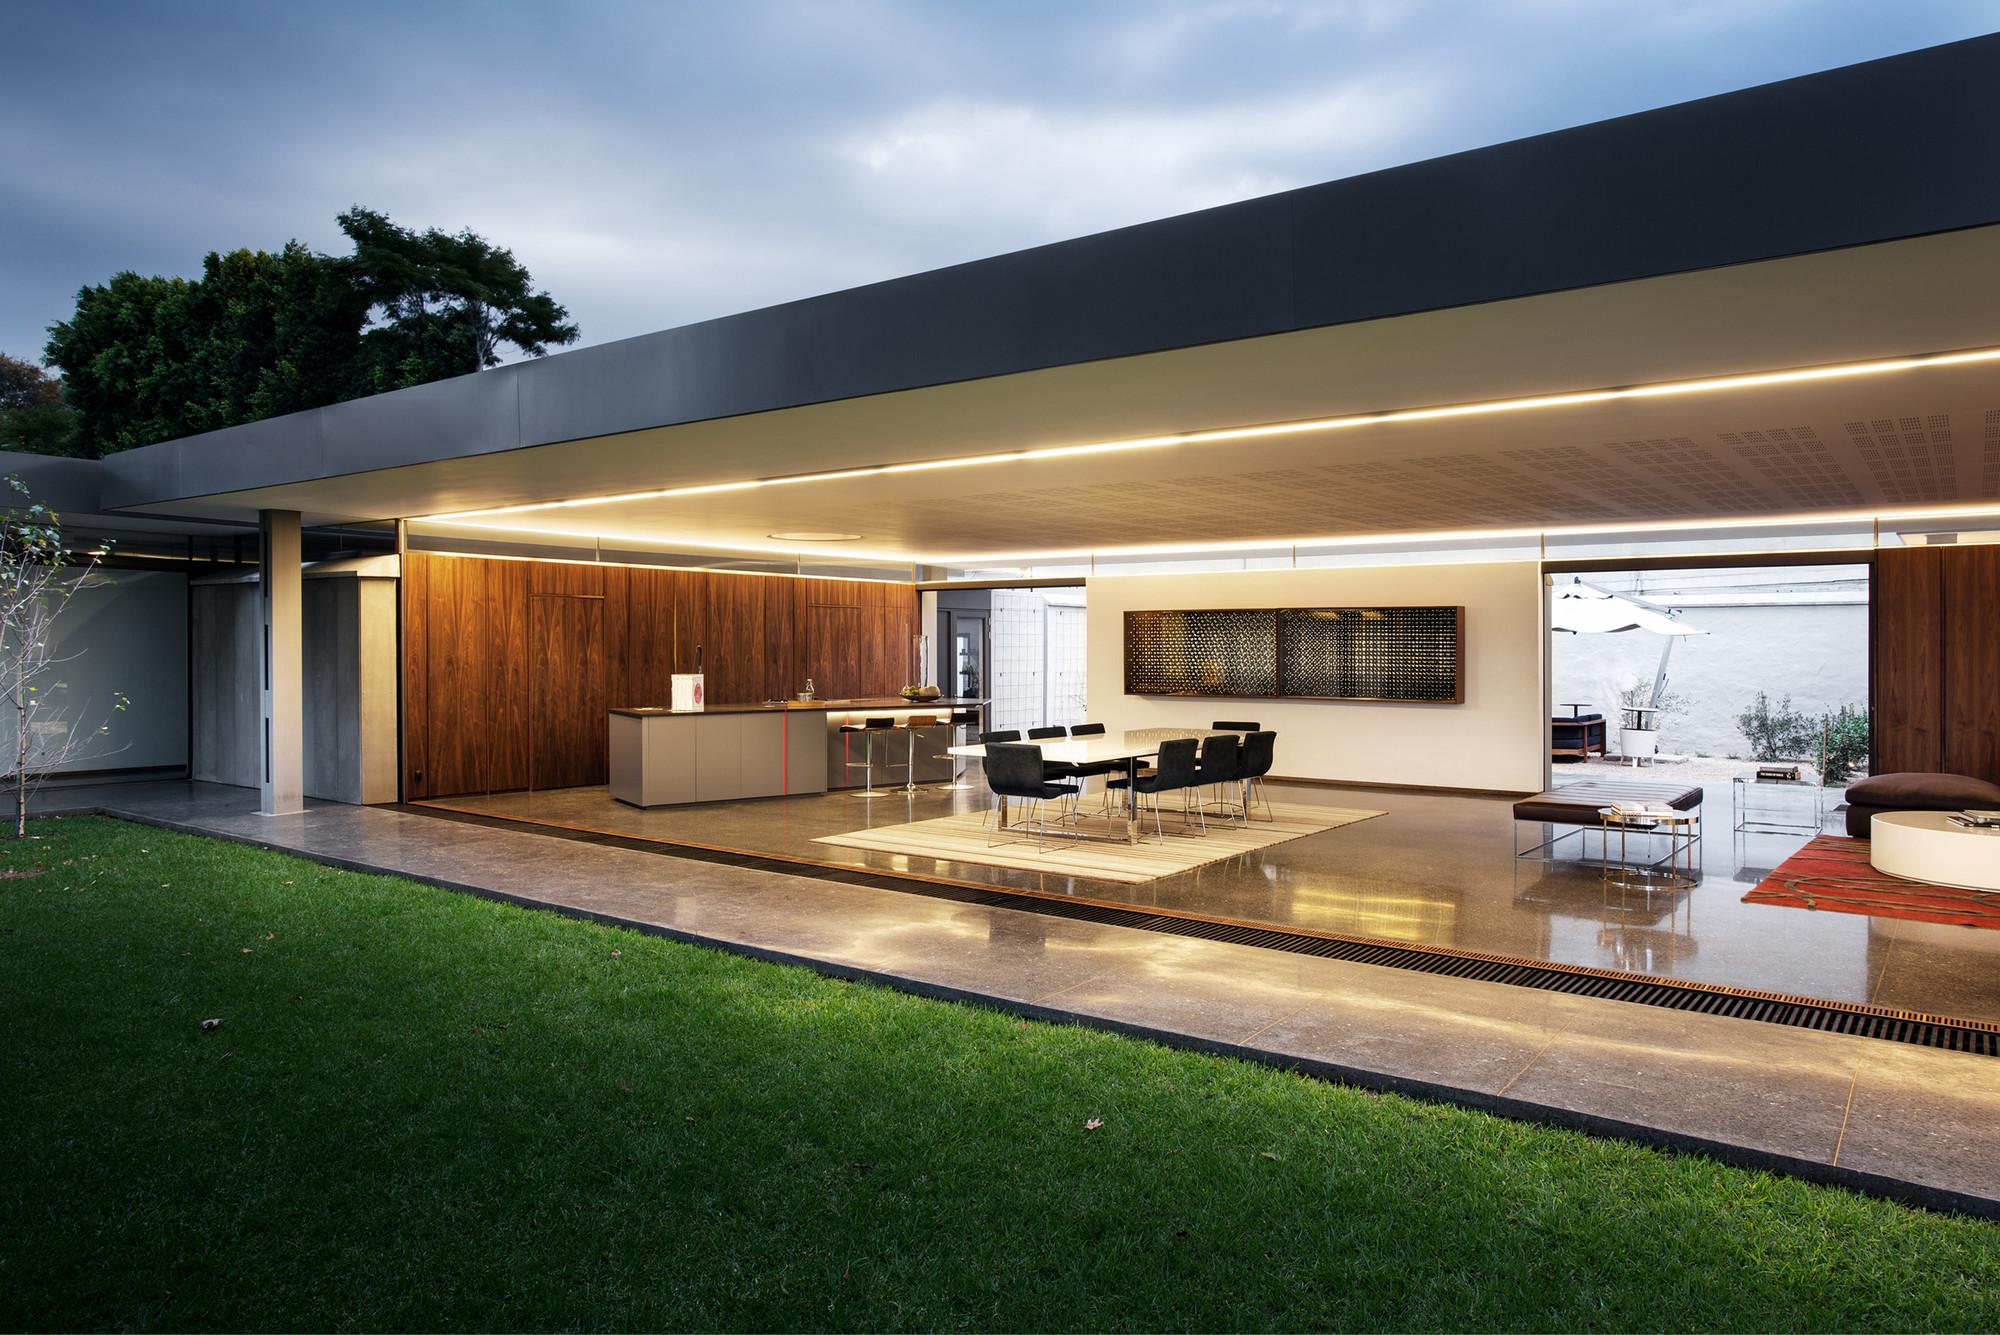 House 02 in Hydepark